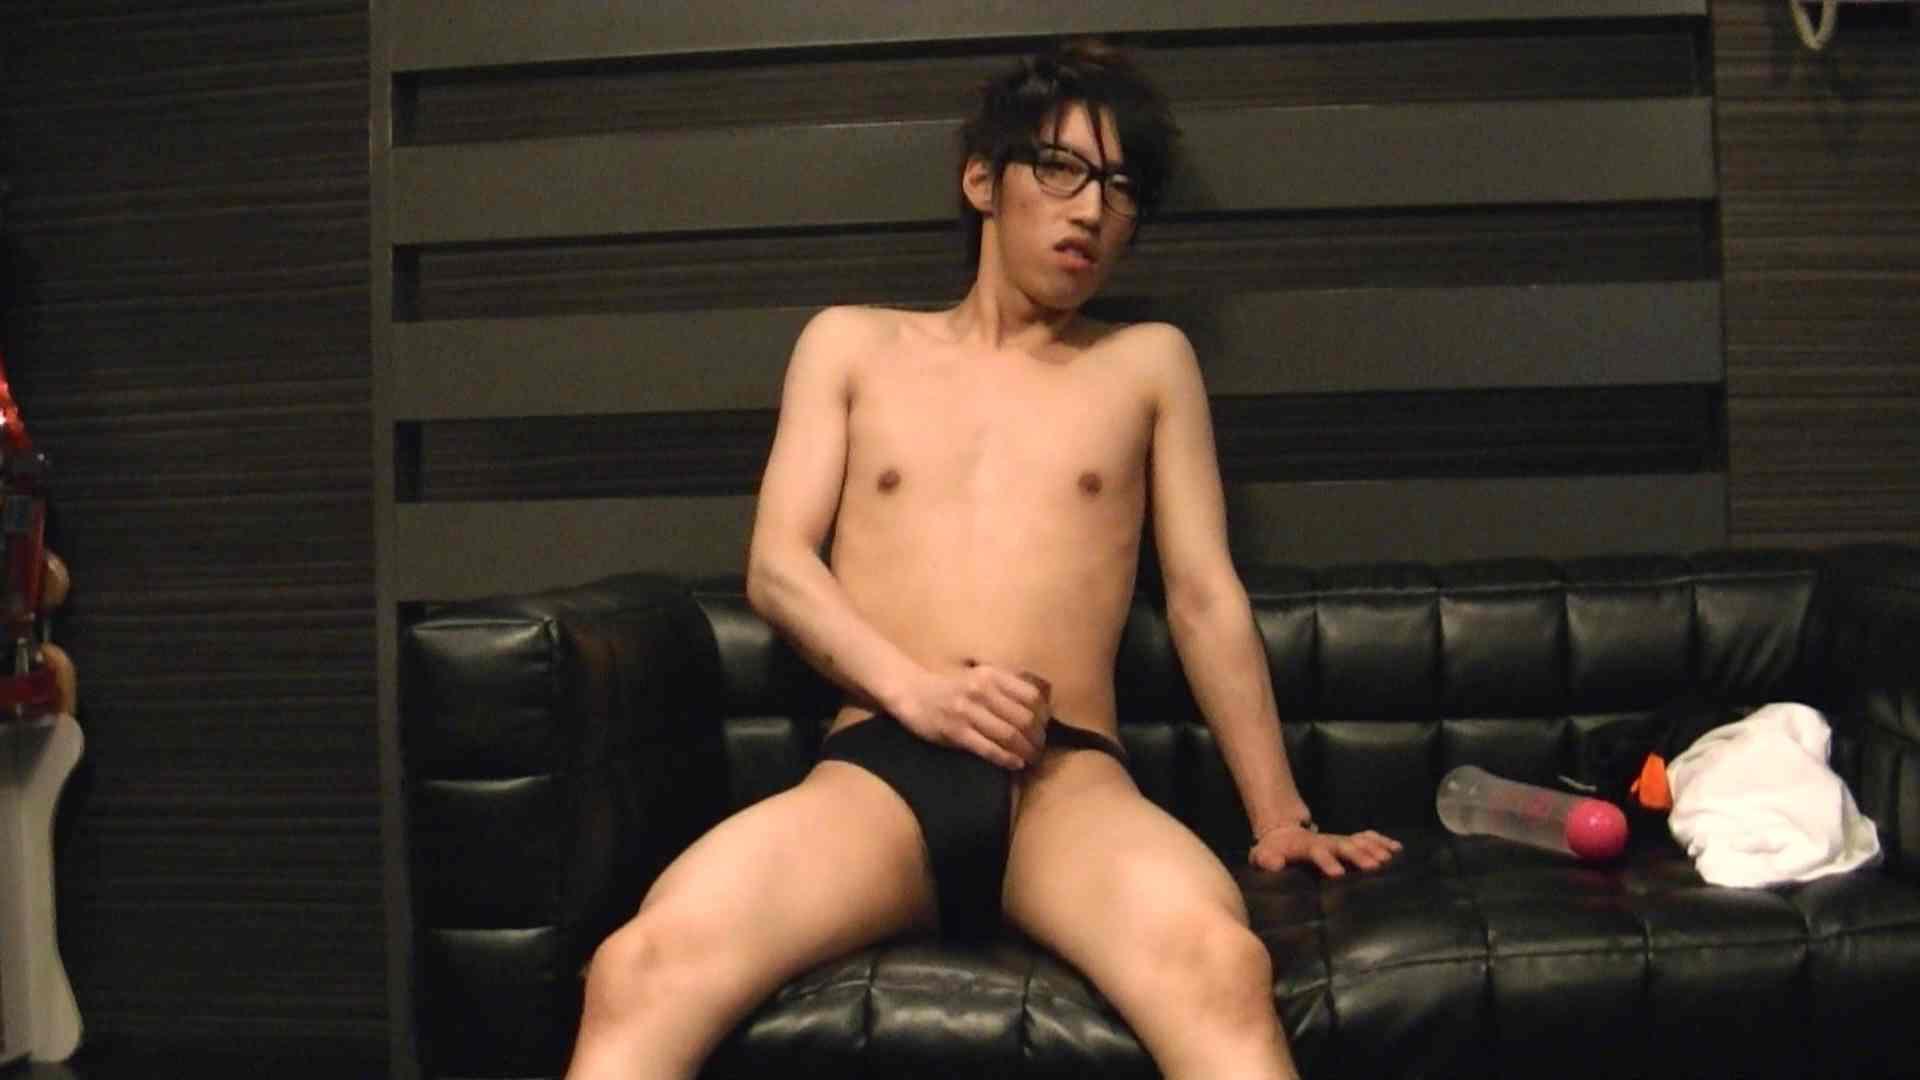 Mr.オナックスさん投稿!HD 貴方のオナニー三万円で撮影させてください。VOL.04 ゲイのオナニー  12画像 6